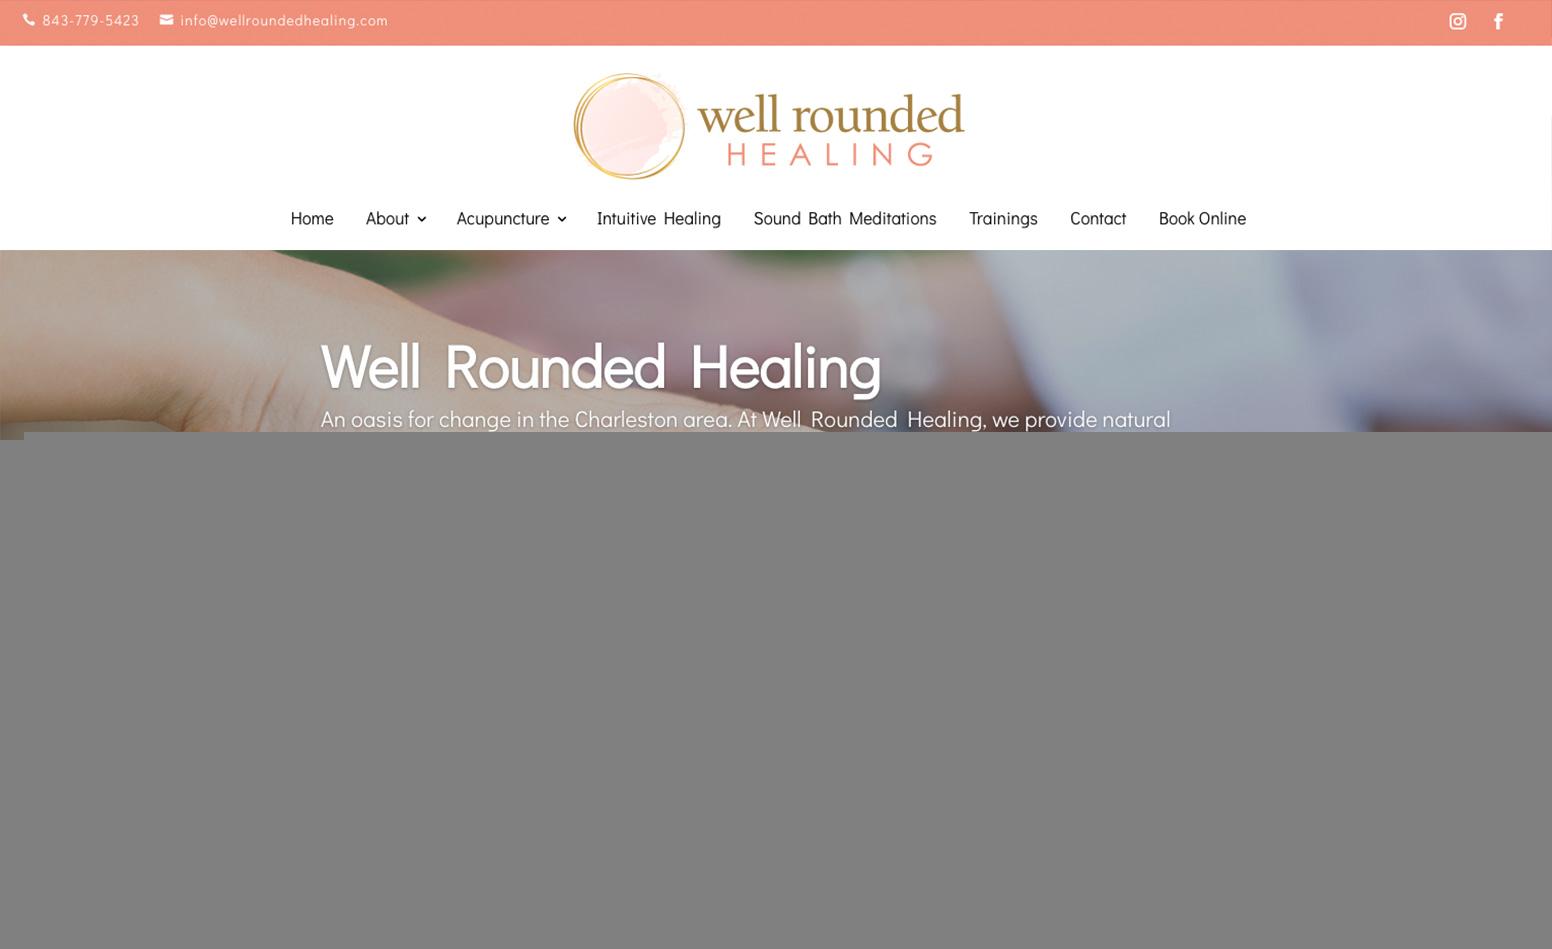 Well Rounded Healing Website, Website Design Charleston SC, Web Design Charleston South Carolina, Marketing Agency Charleston SC, Branding Charleston SC, Graphic Design Charleston SC